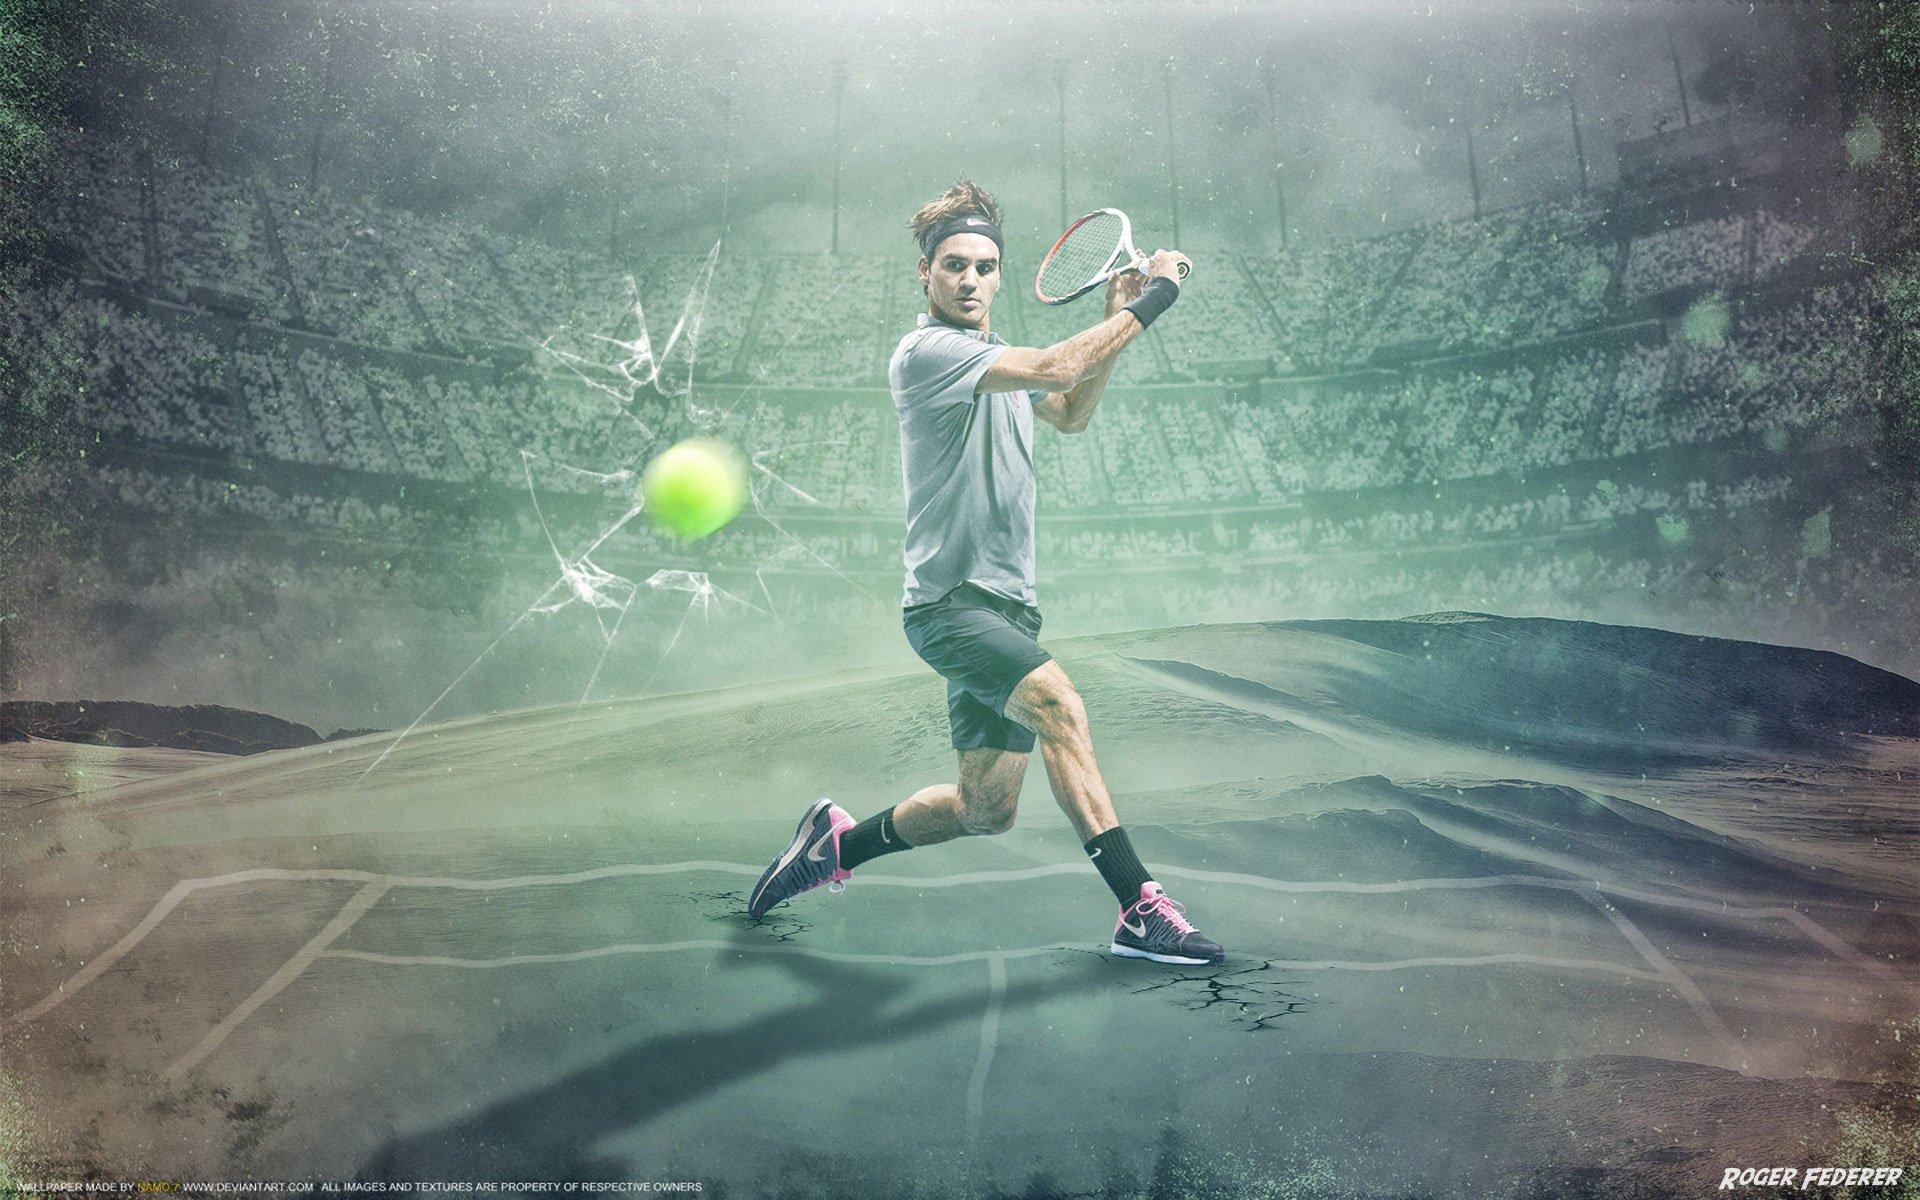 Roger federer full hd wallpaper and background image 1920x1200 sports roger federer wallpaper voltagebd Image collections